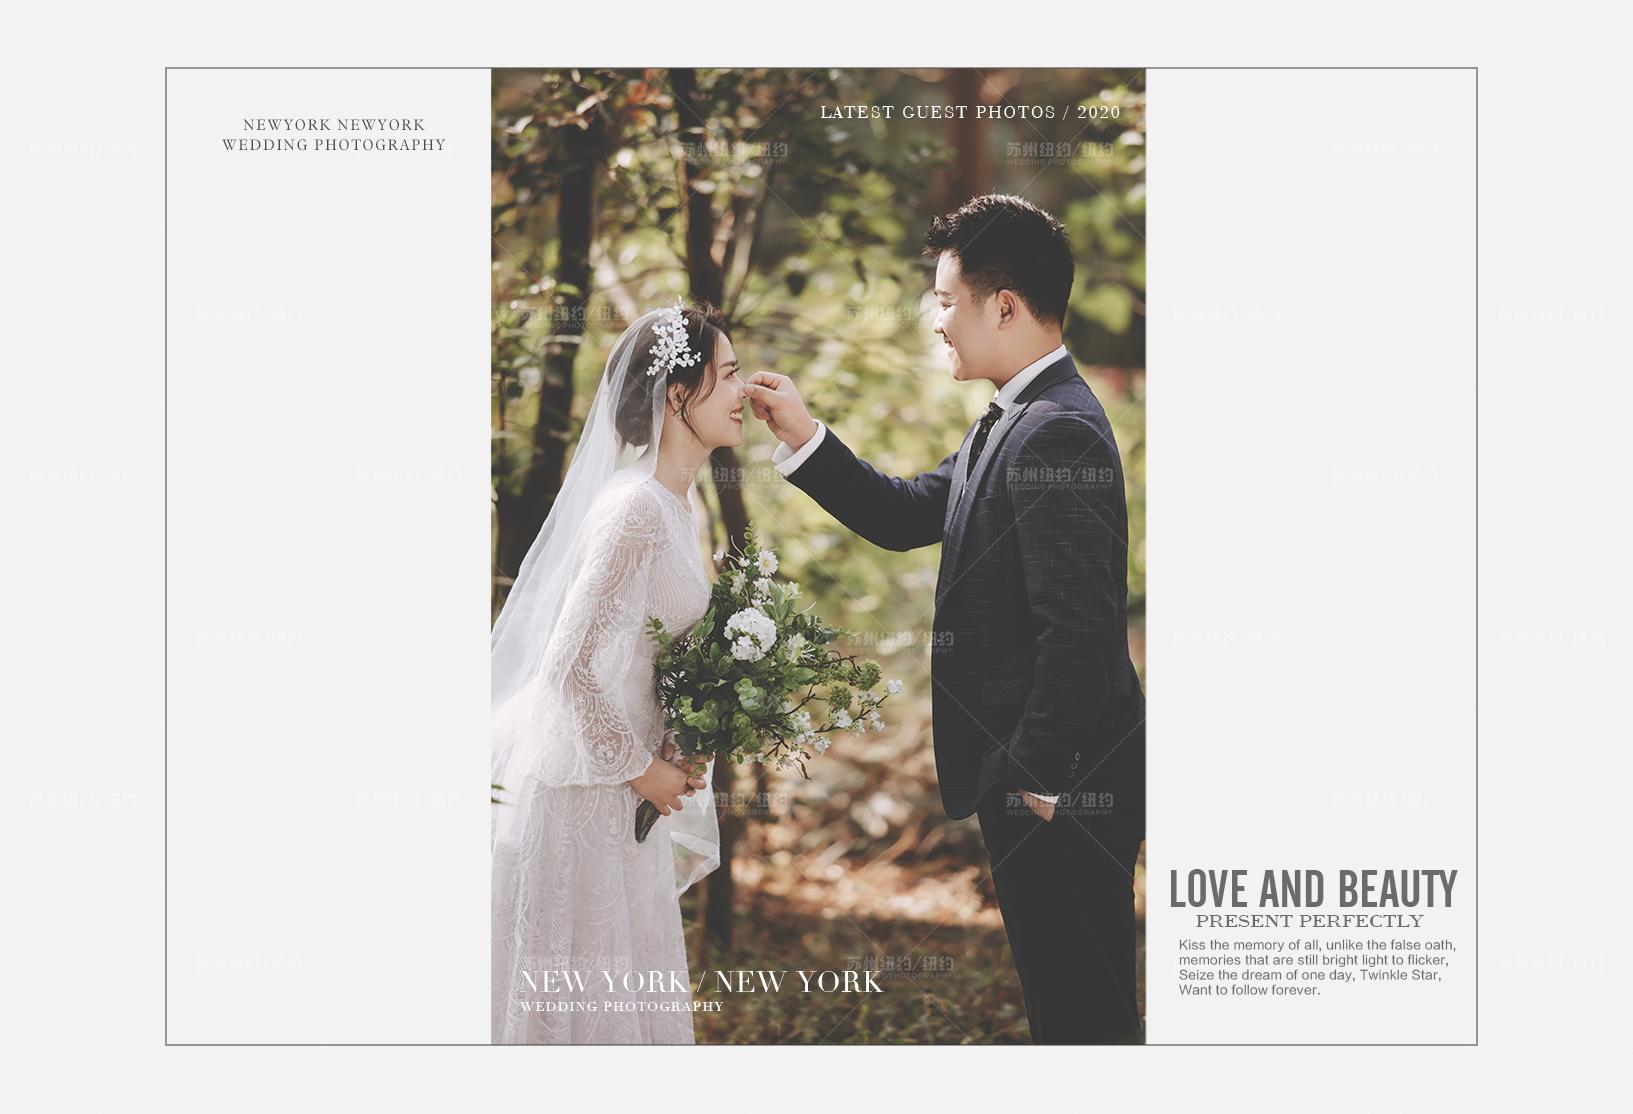 Mr.陆 & Ms.陈(纽约纽约最新客照)婚纱摄影照